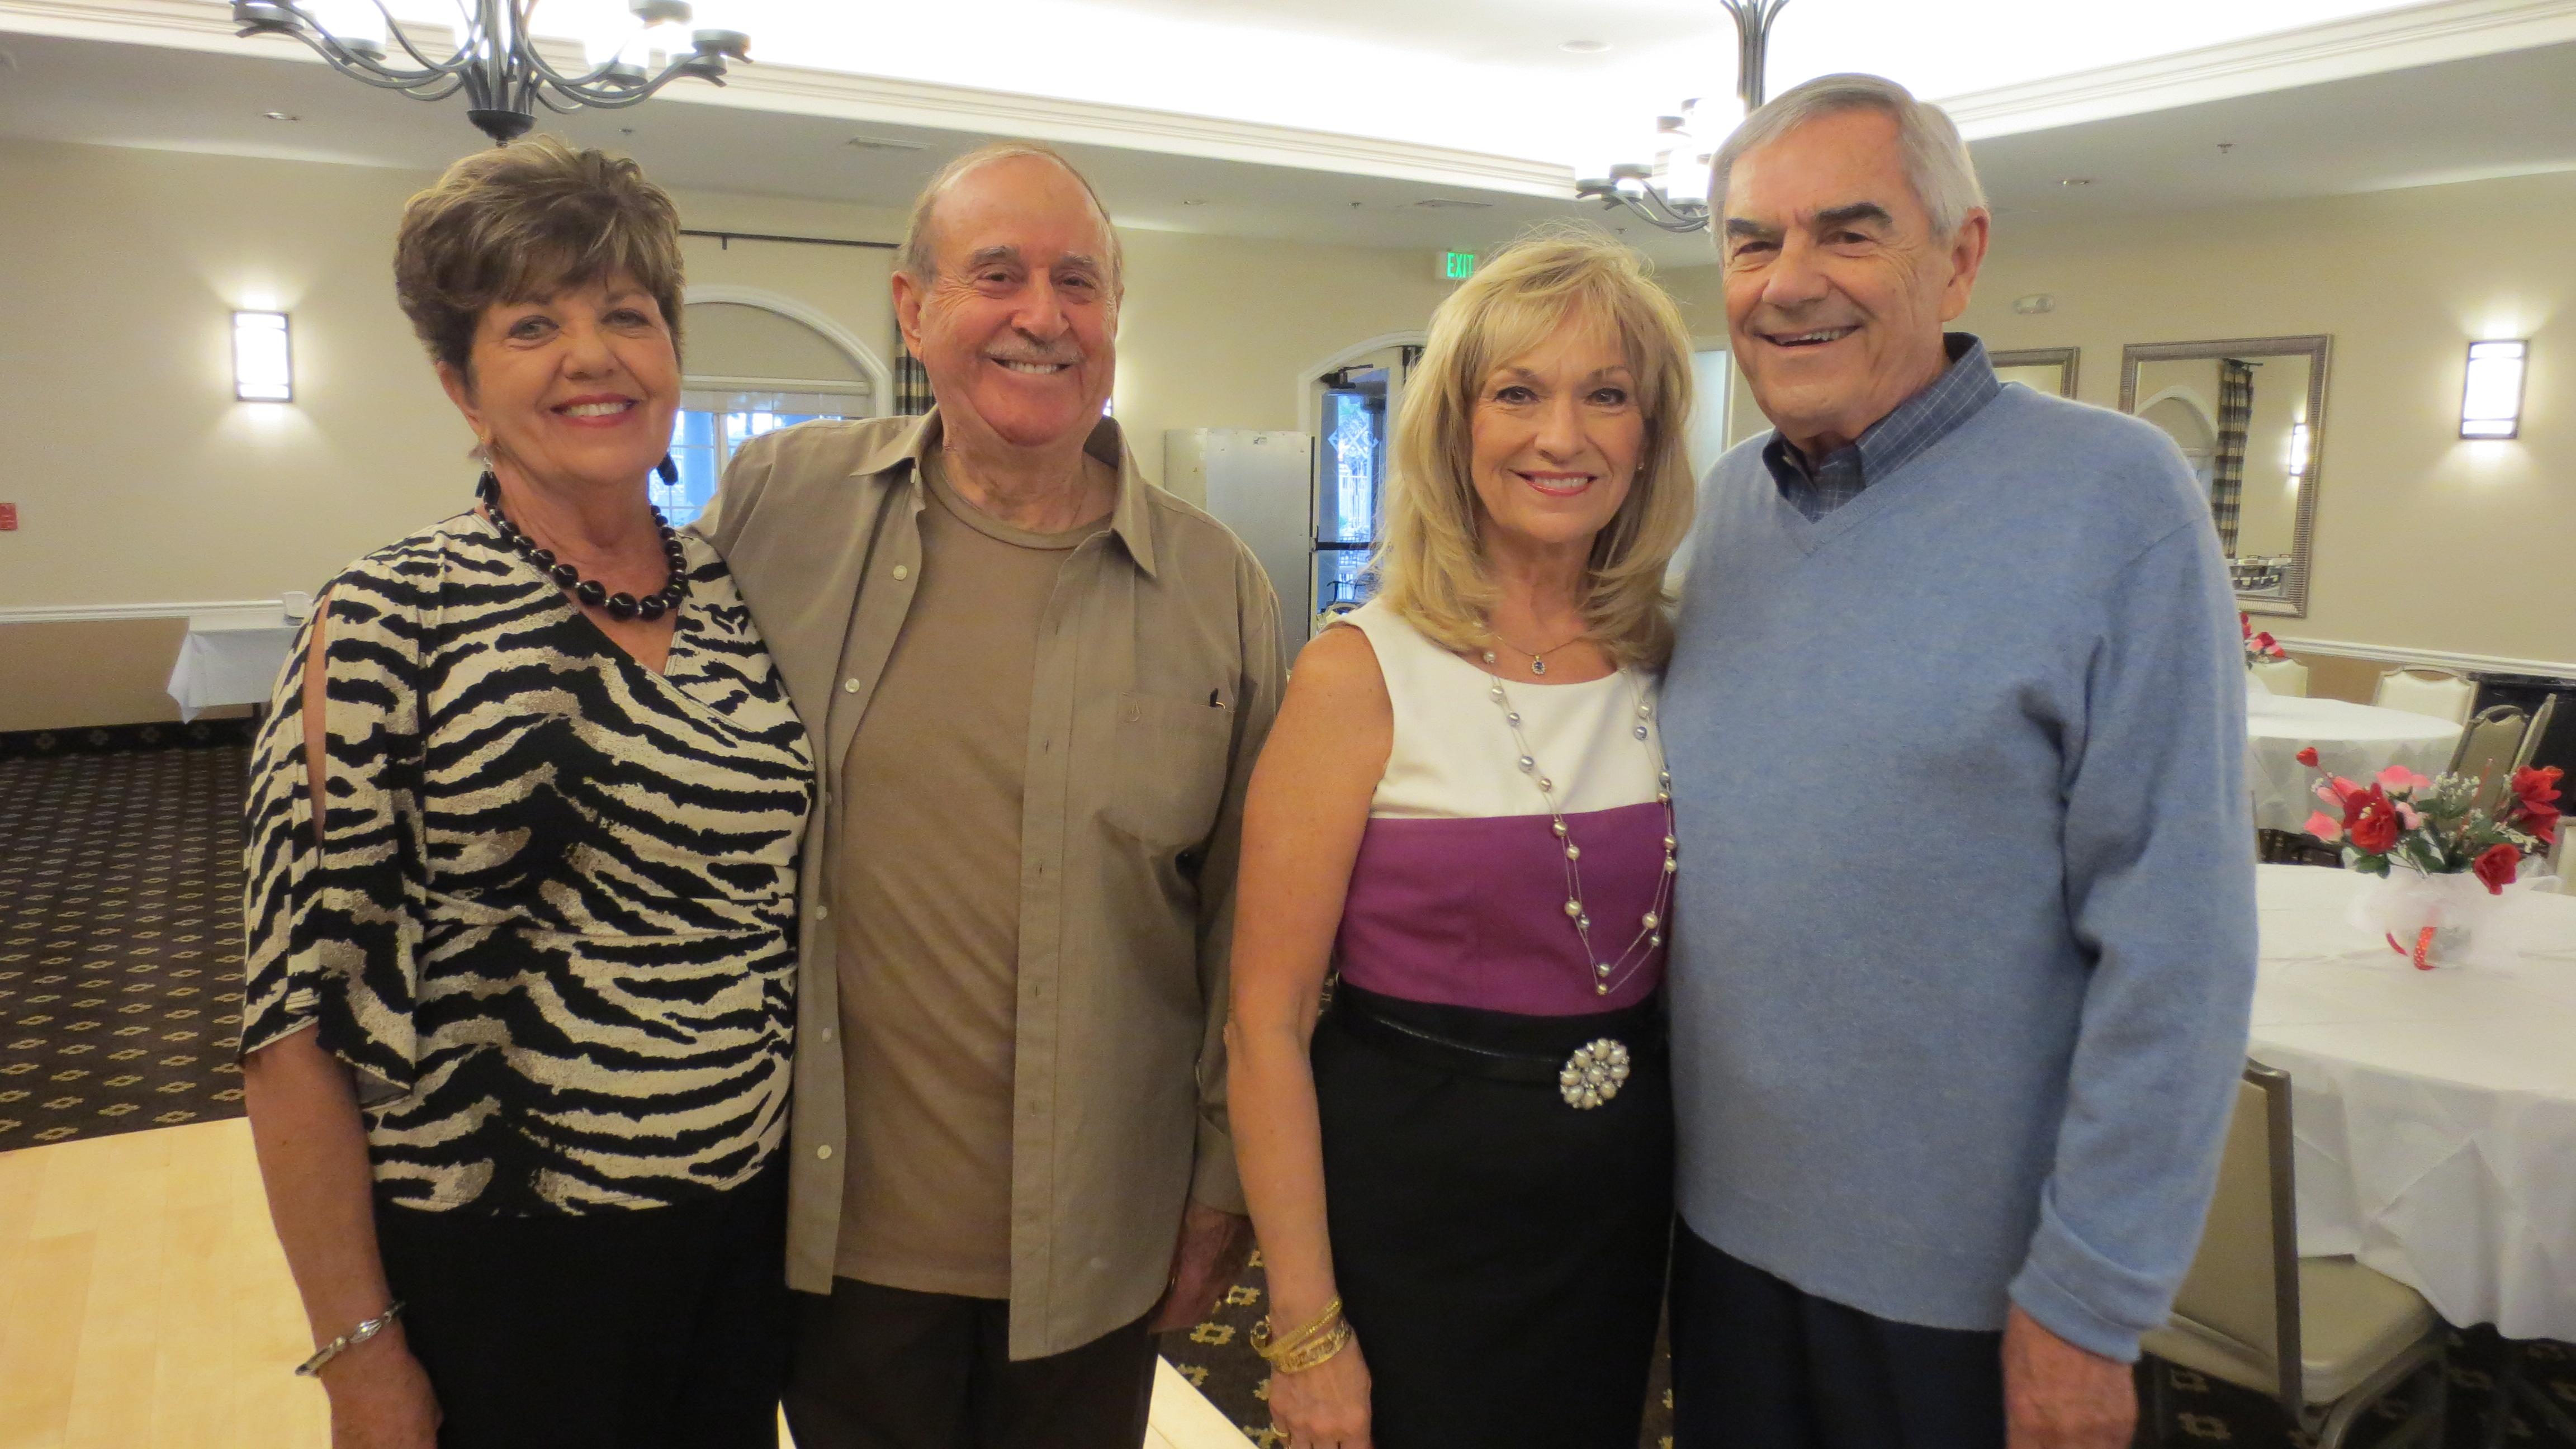 Veta & Tony Zarifis, Cheryl & Stan Newton